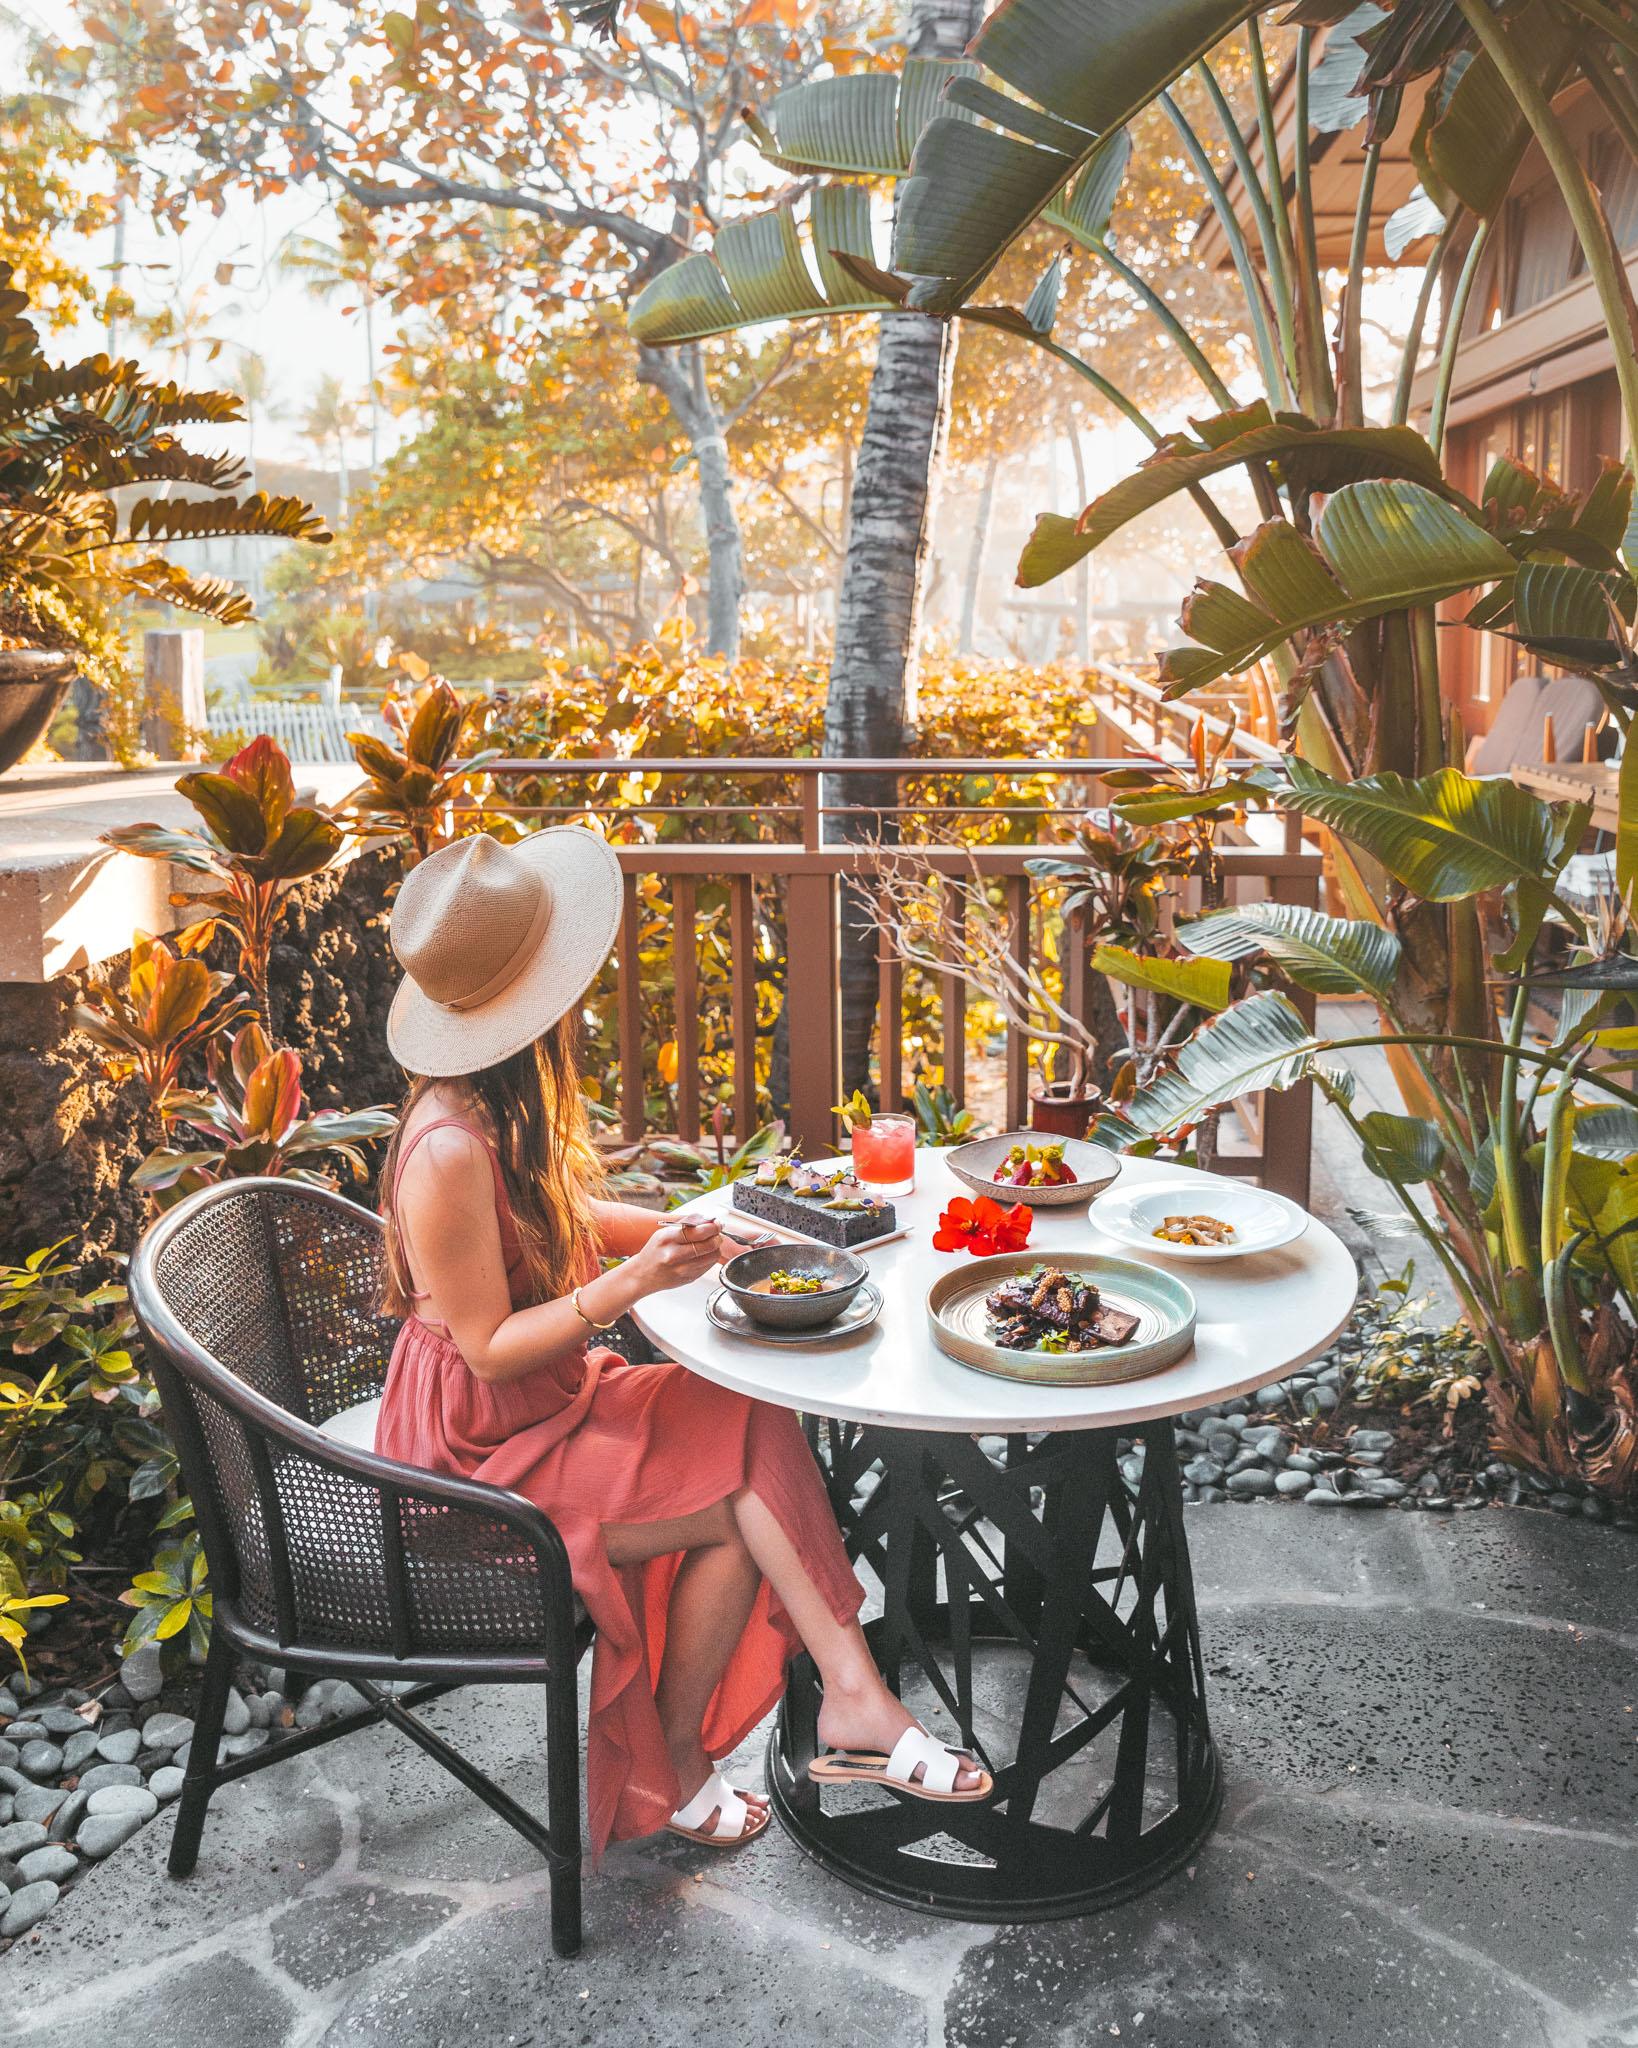 Golden hour dinner at Ulu // A Luxury Stay on the Big Island: Four Seasons Resort Hualalai // #readysetjetset #hawaii #bigisland #luxuryhotels #beachresorts #usa #travel